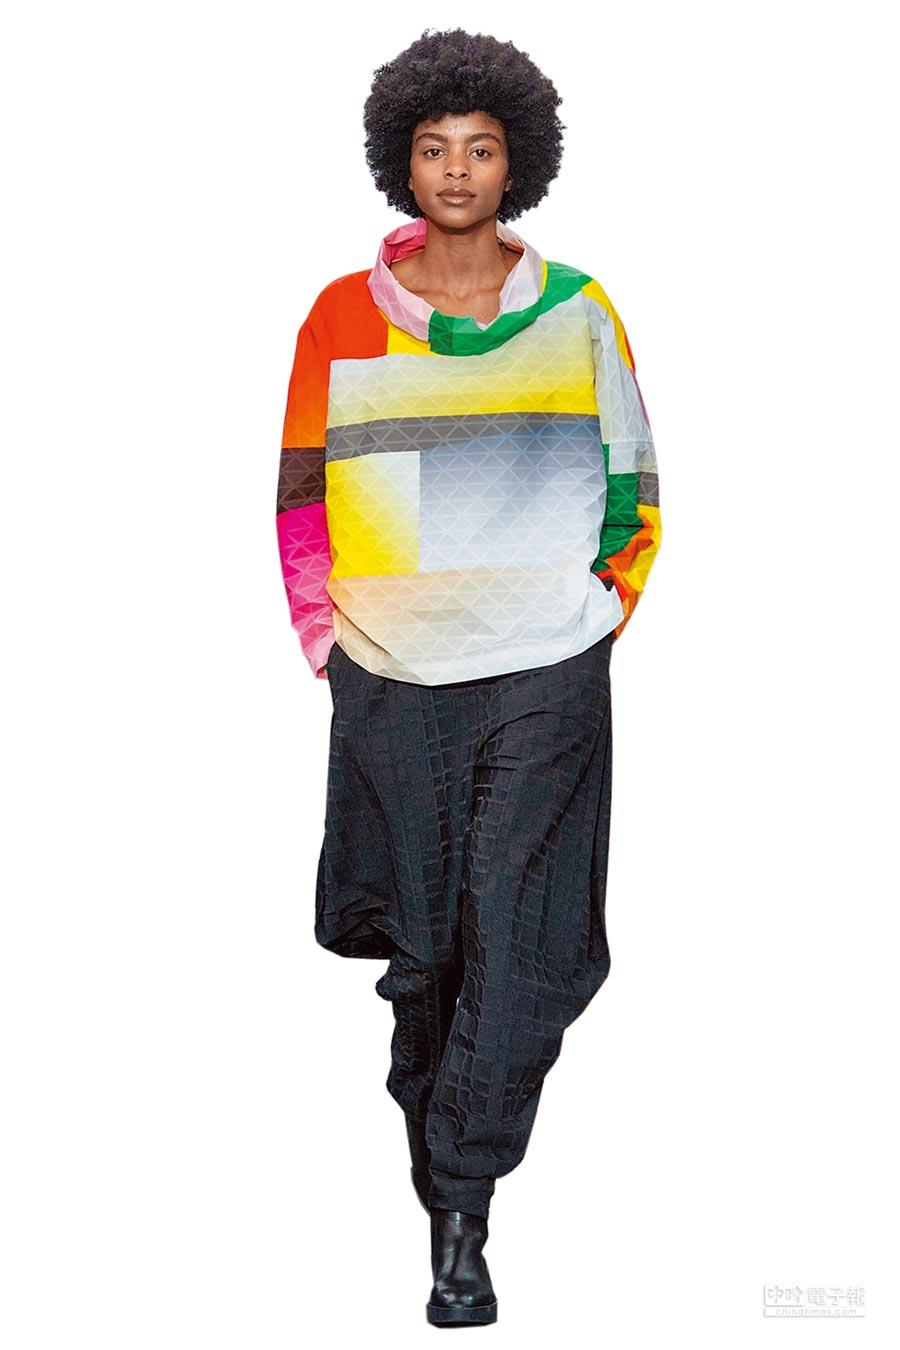 ISSEY MIYAKE利用「BLINK」布料,打造如萬花筒般的凹凸新視覺。(ISSEY MIYAKE提供)